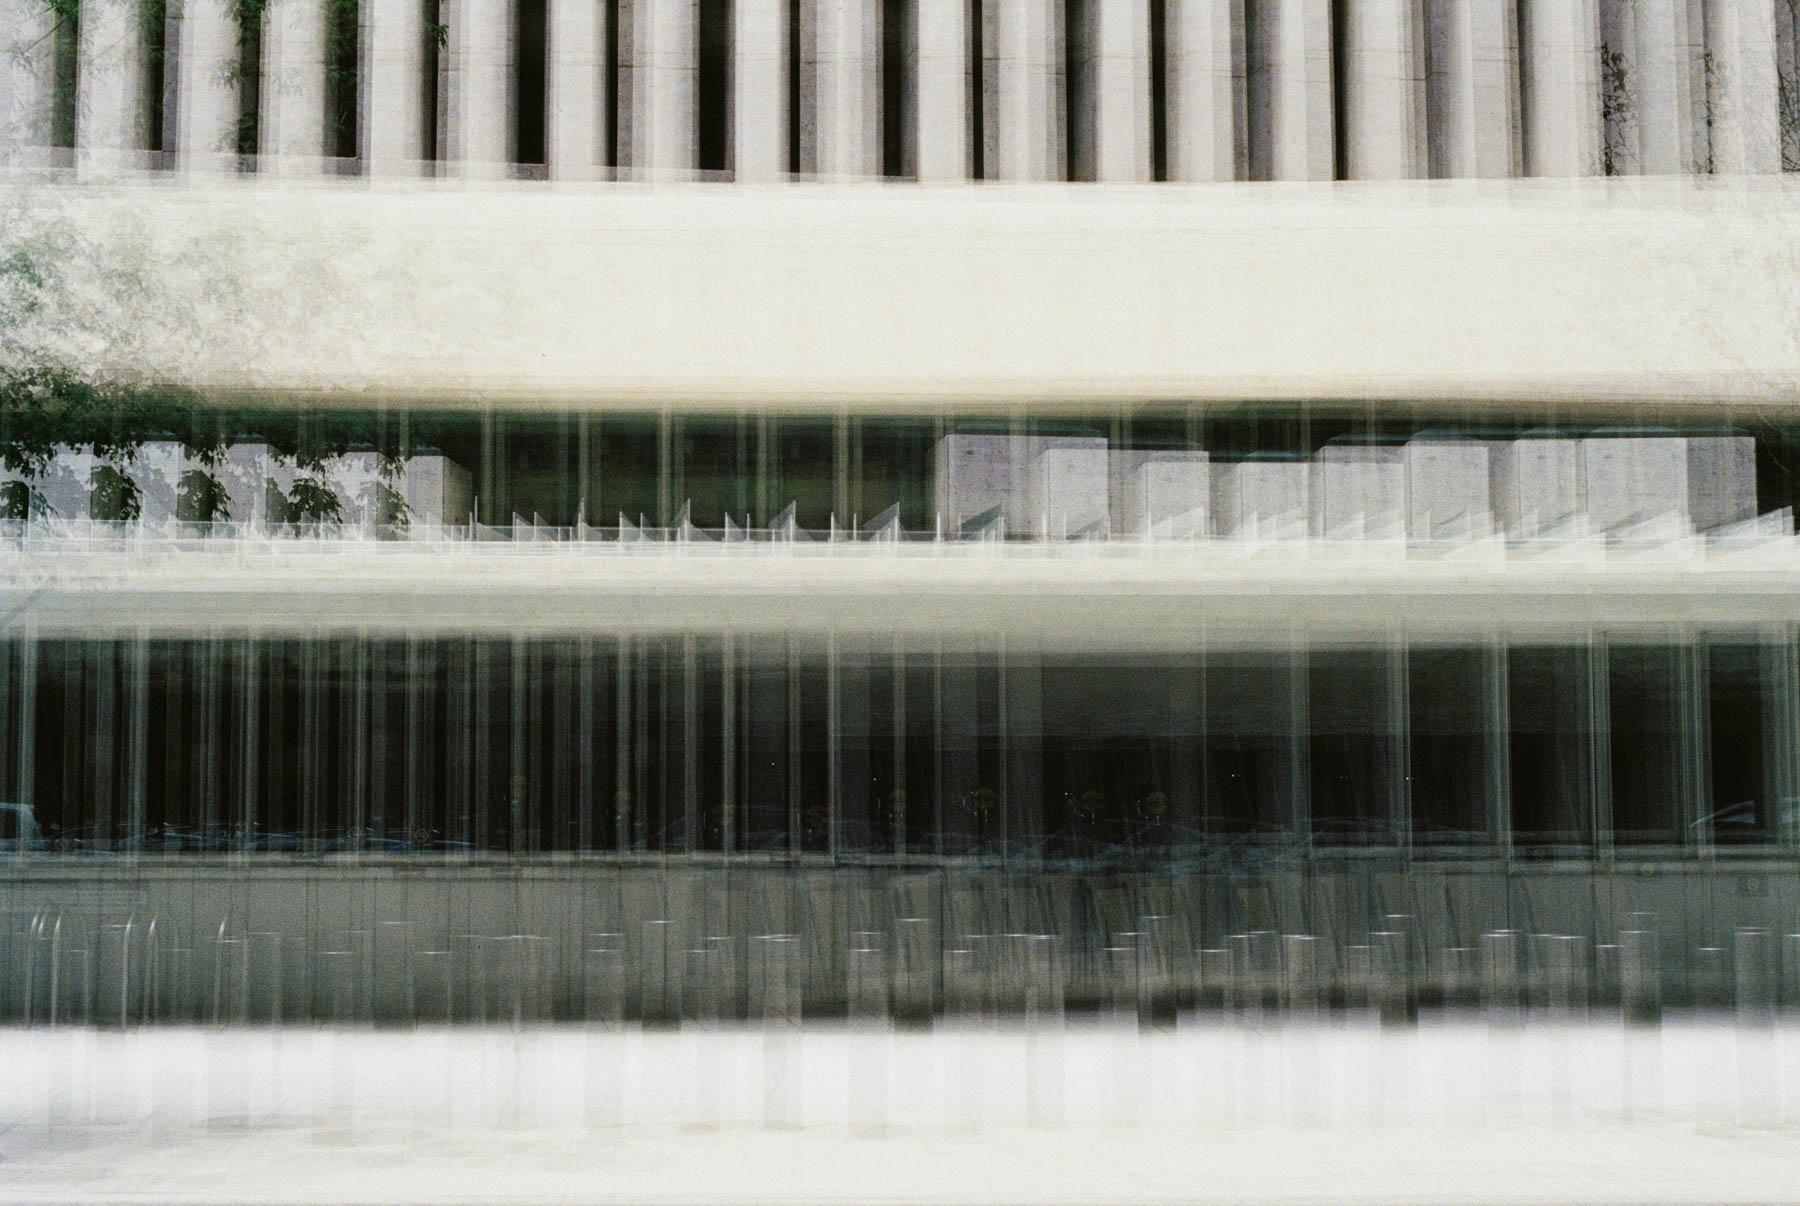 parallax #1 | Nikon F100 | Kodak 400 | Deborah Candeub